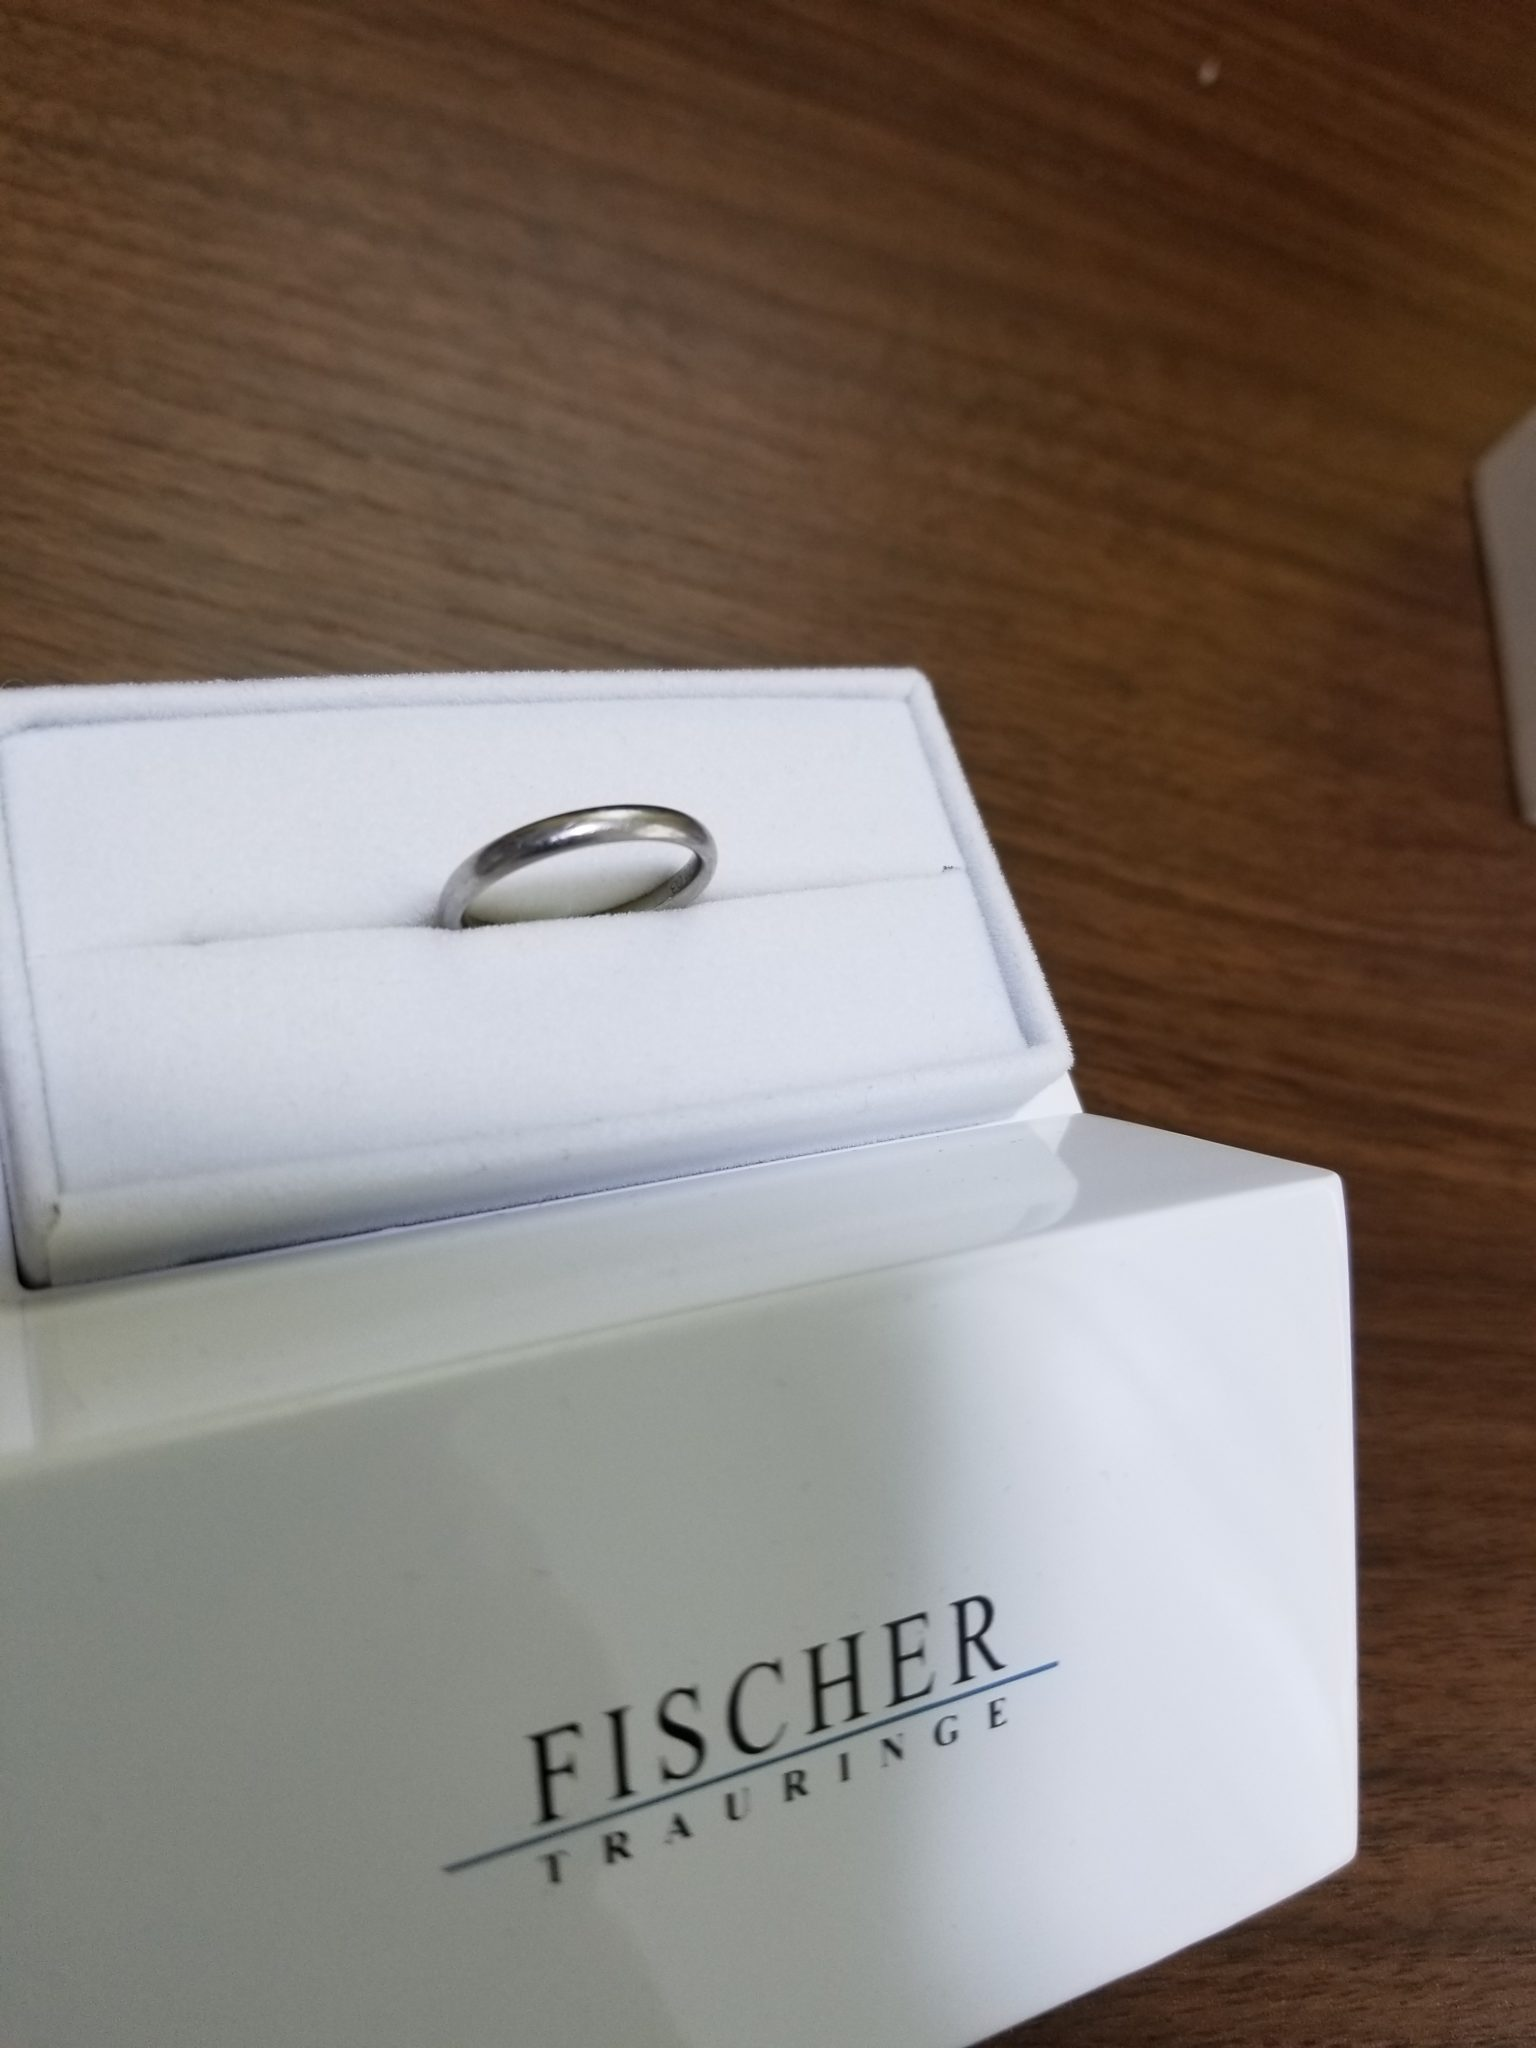 FISCHER(フィッシャー)の結婚指輪2